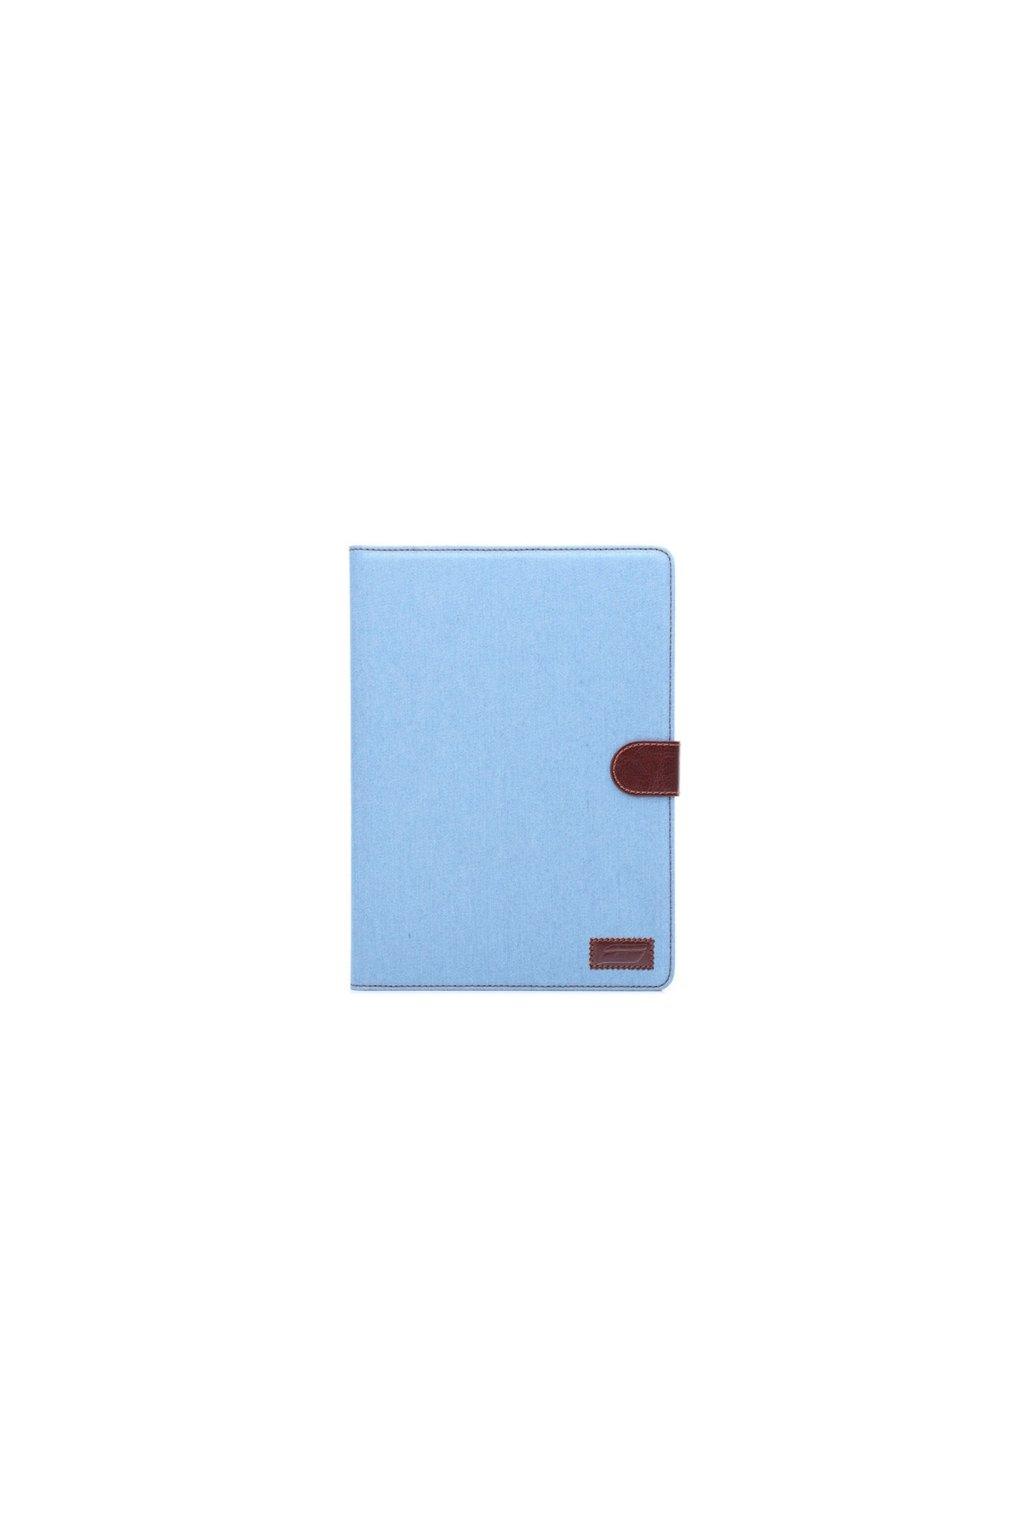 Pouzdro Denim Leather iPad Air 2, blue/světle modrá